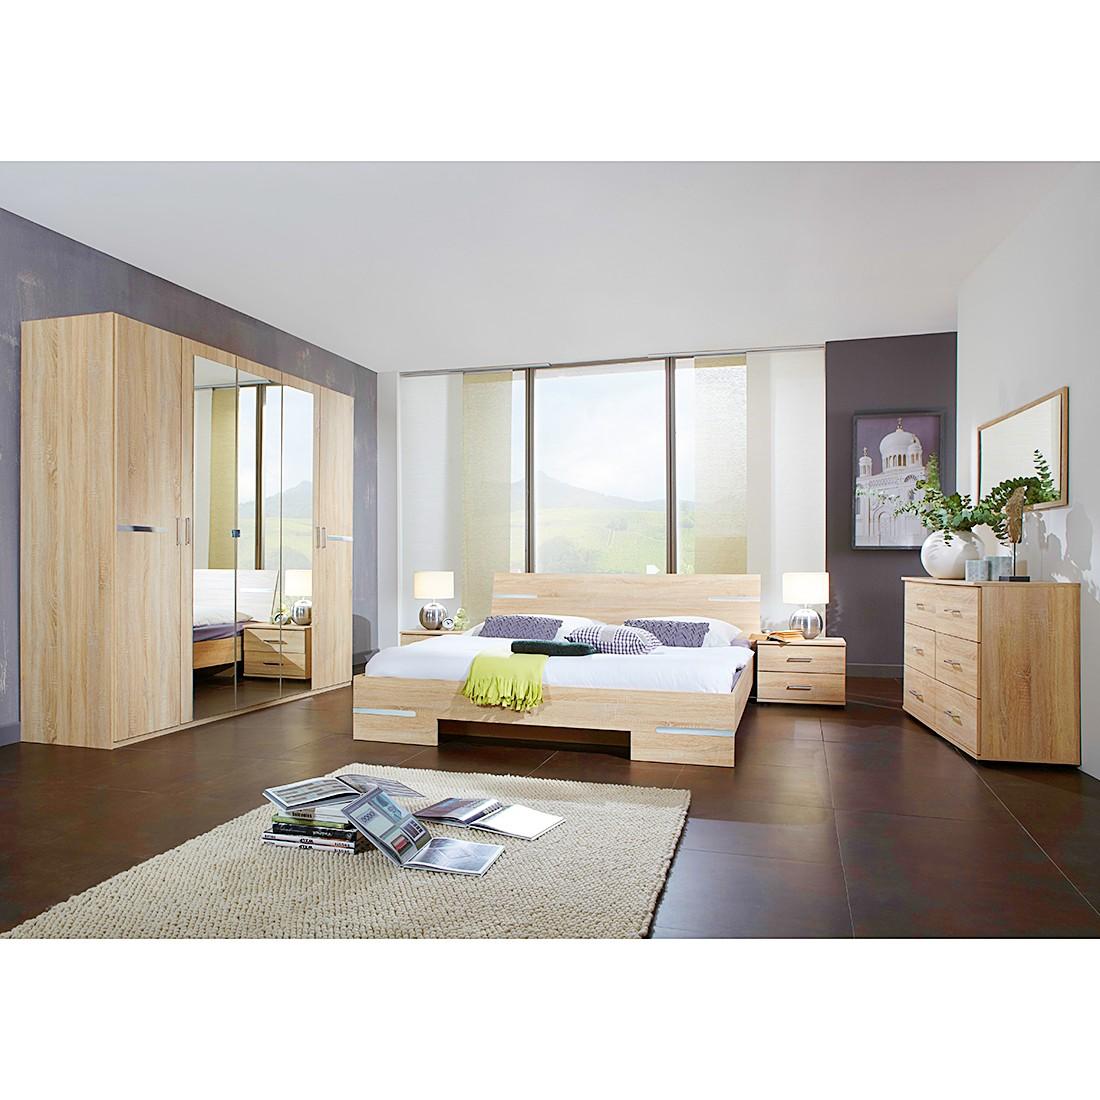 Chambre à coucher Yukon (4 éléments)